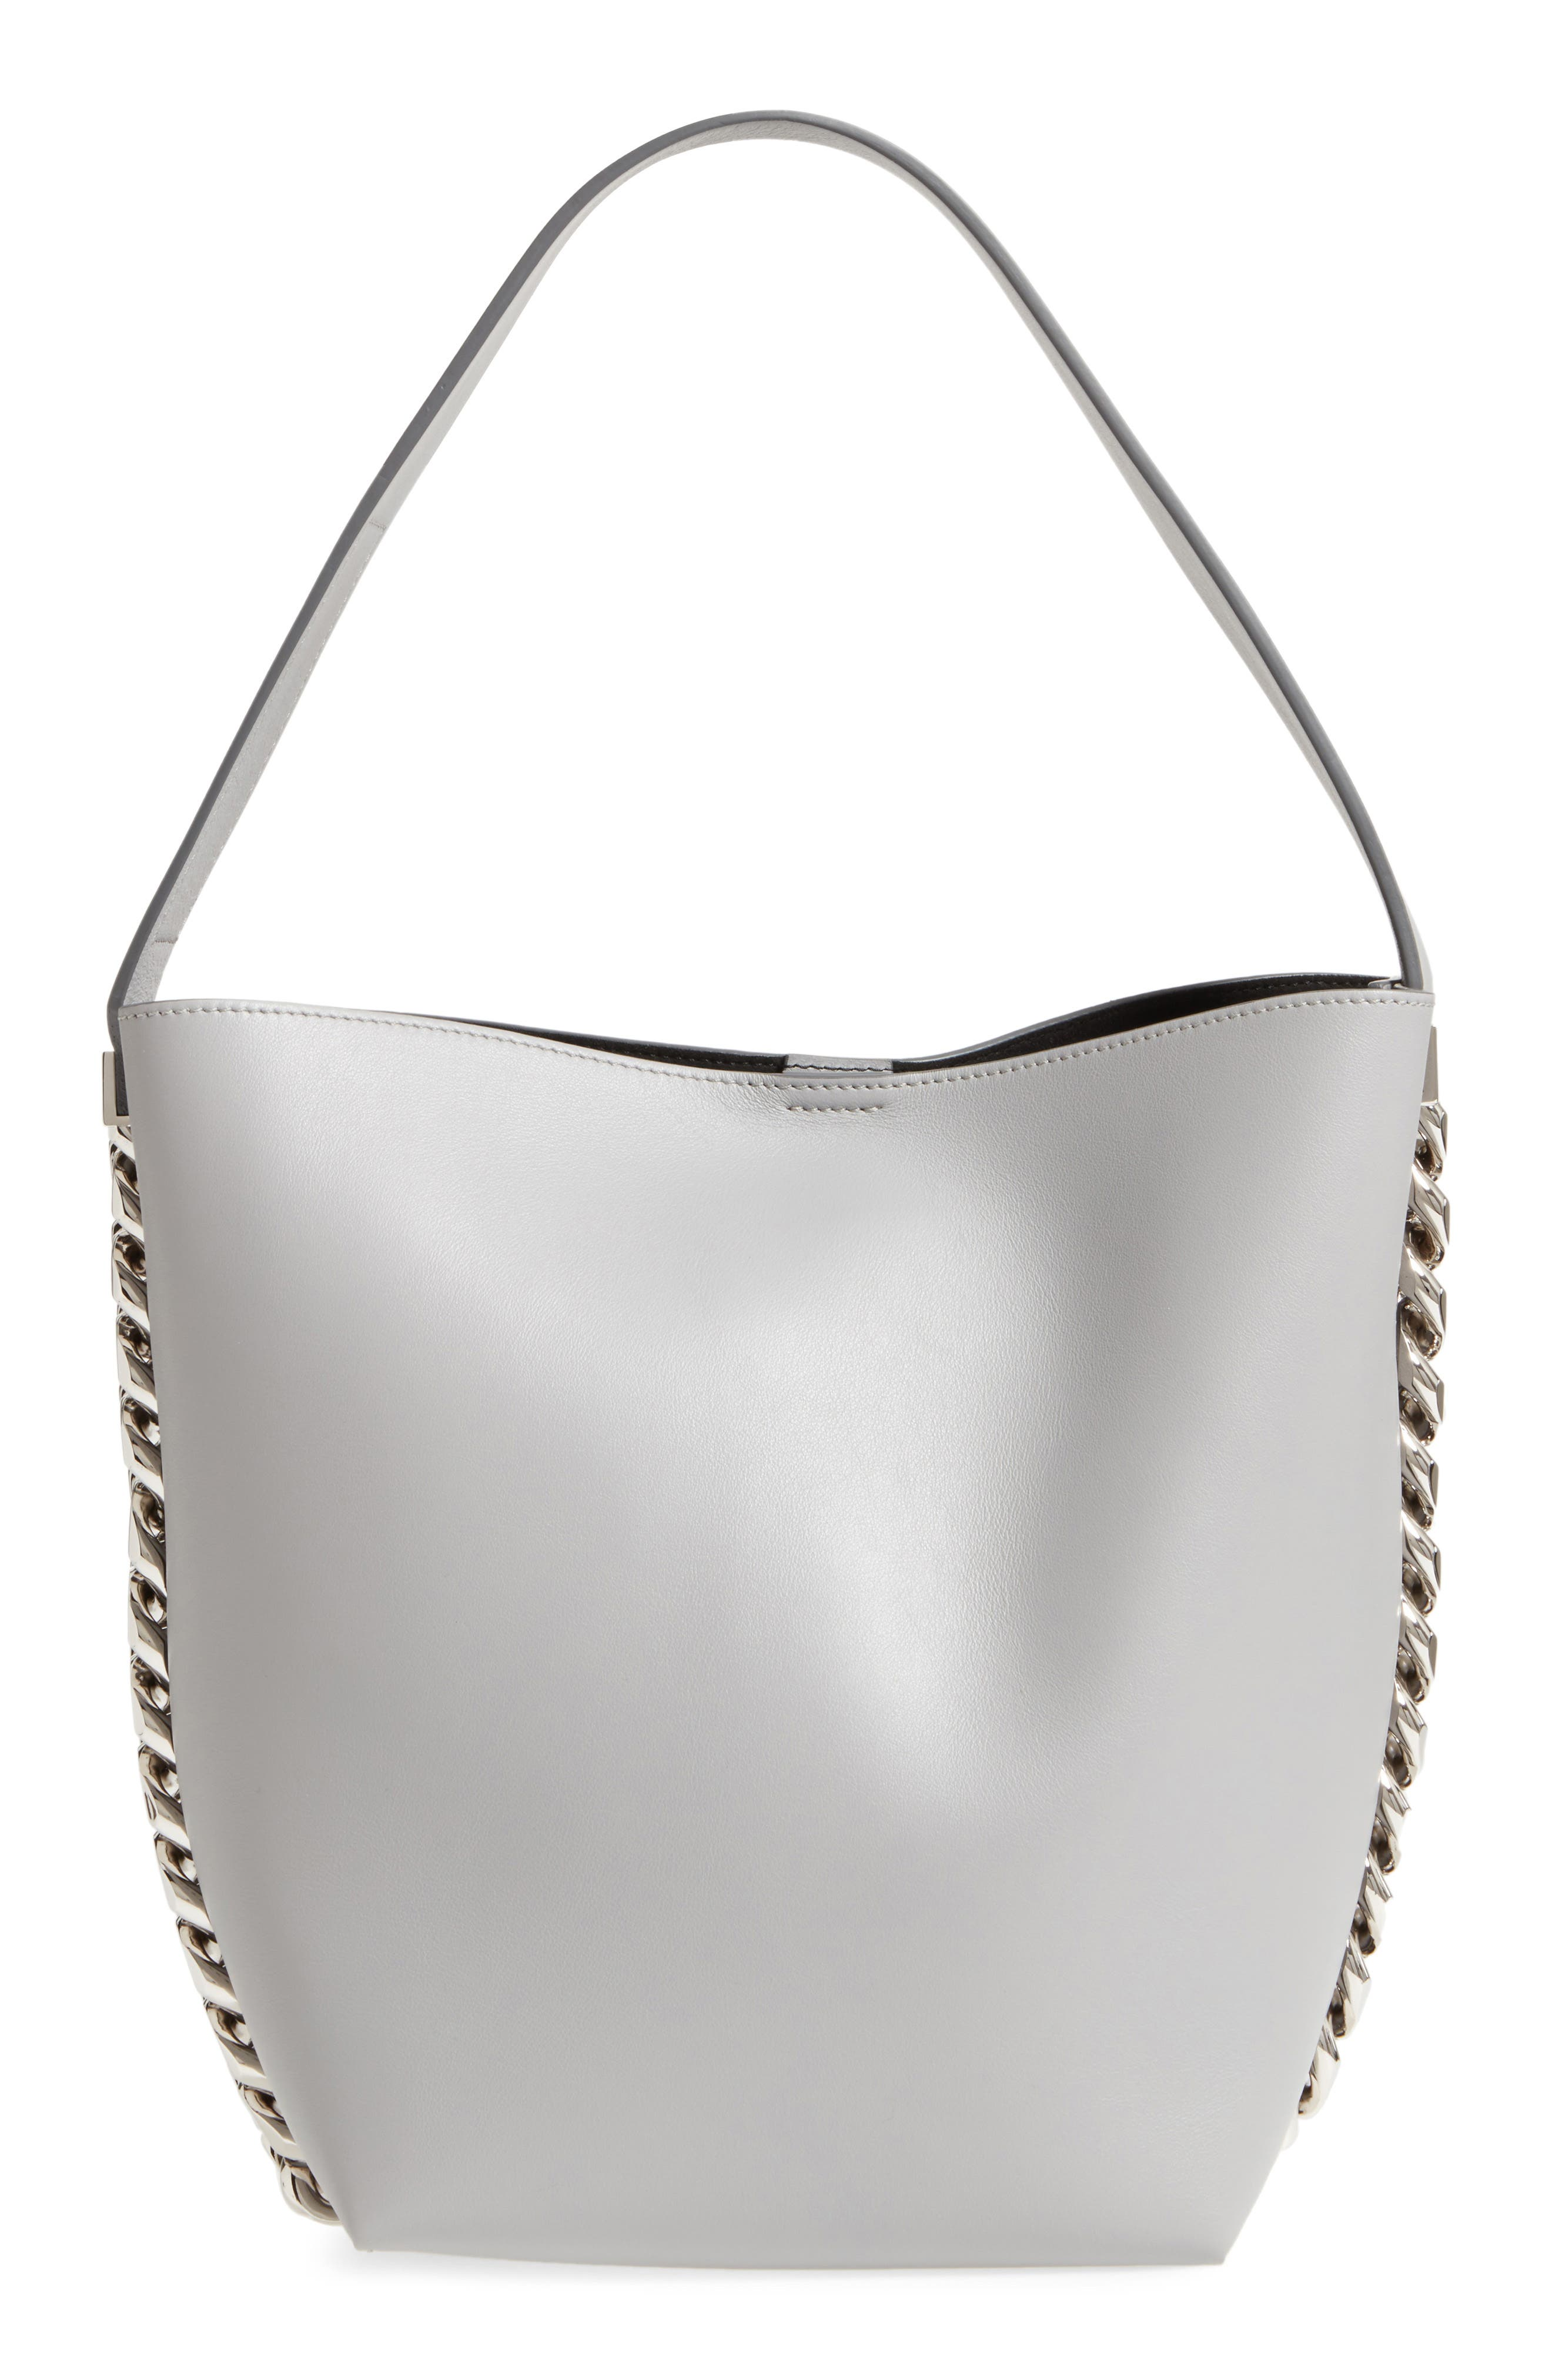 Infinity Calfskin Leather Bucket Bag,                             Main thumbnail 1, color,                             051